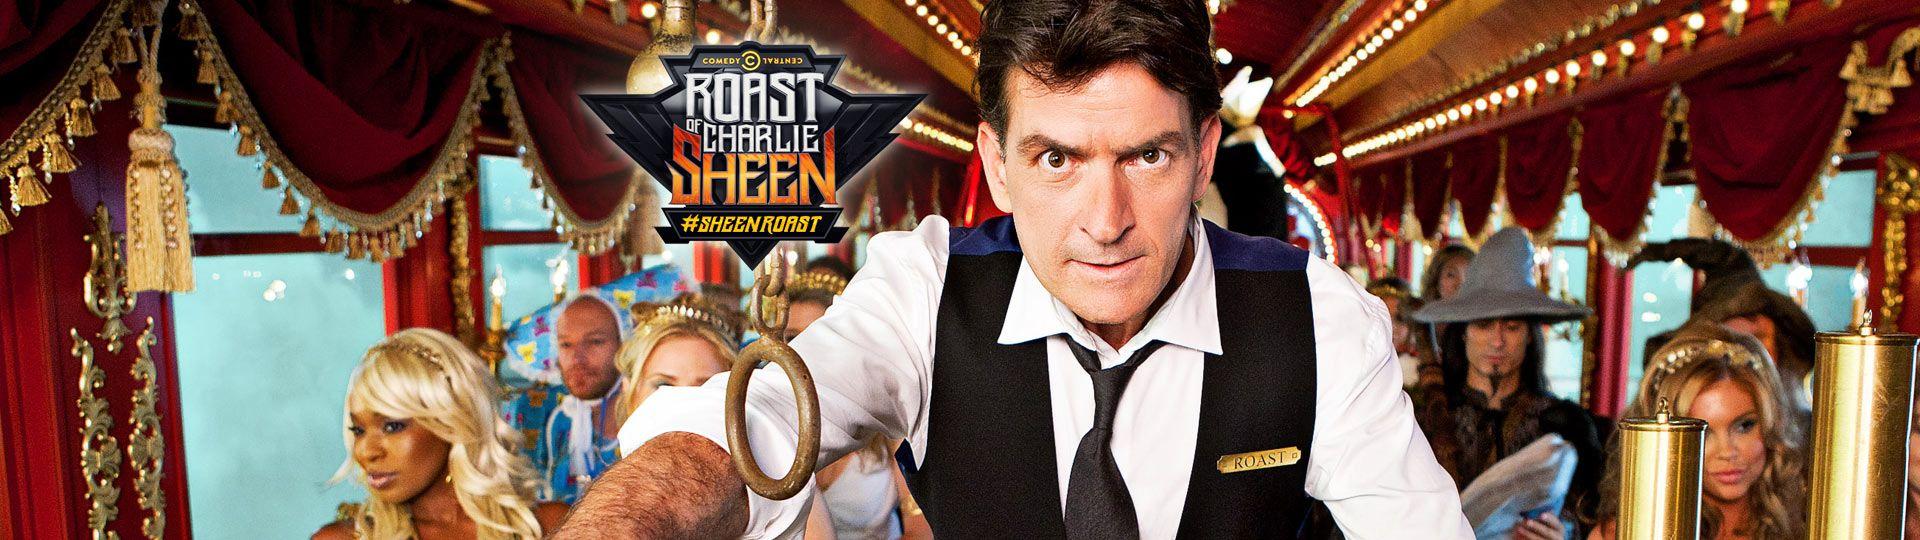 the roast of charlie sheen german download